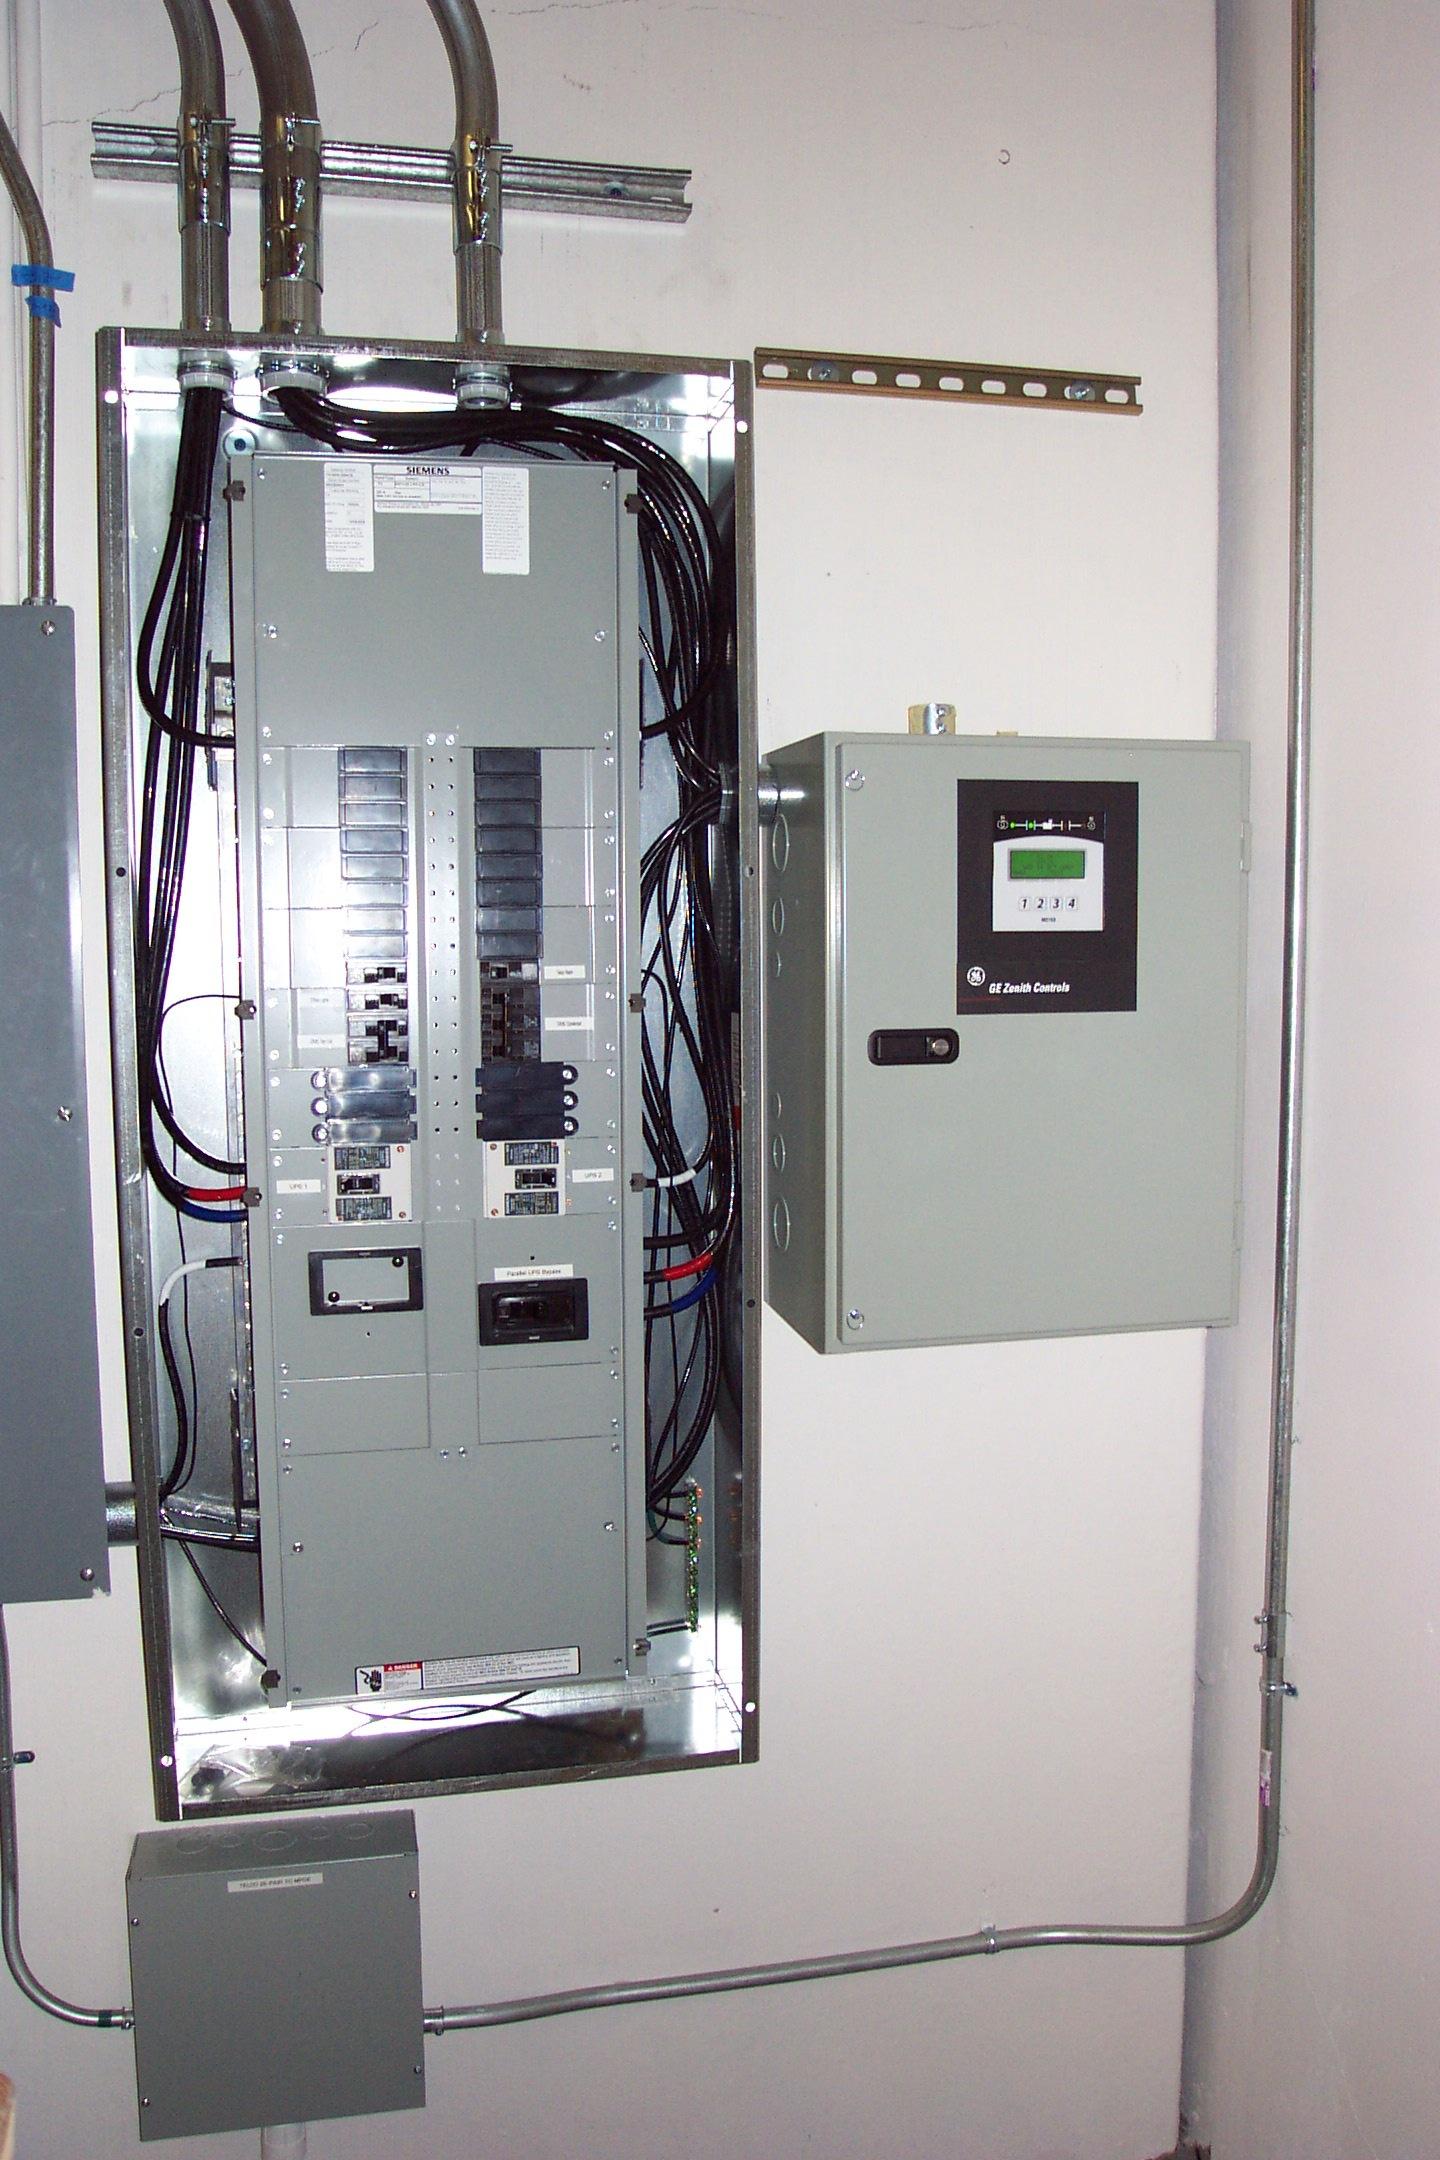 ge lighting contactor wiring diagram dexter electric trailer brake a panelboard ~ elsavadorla